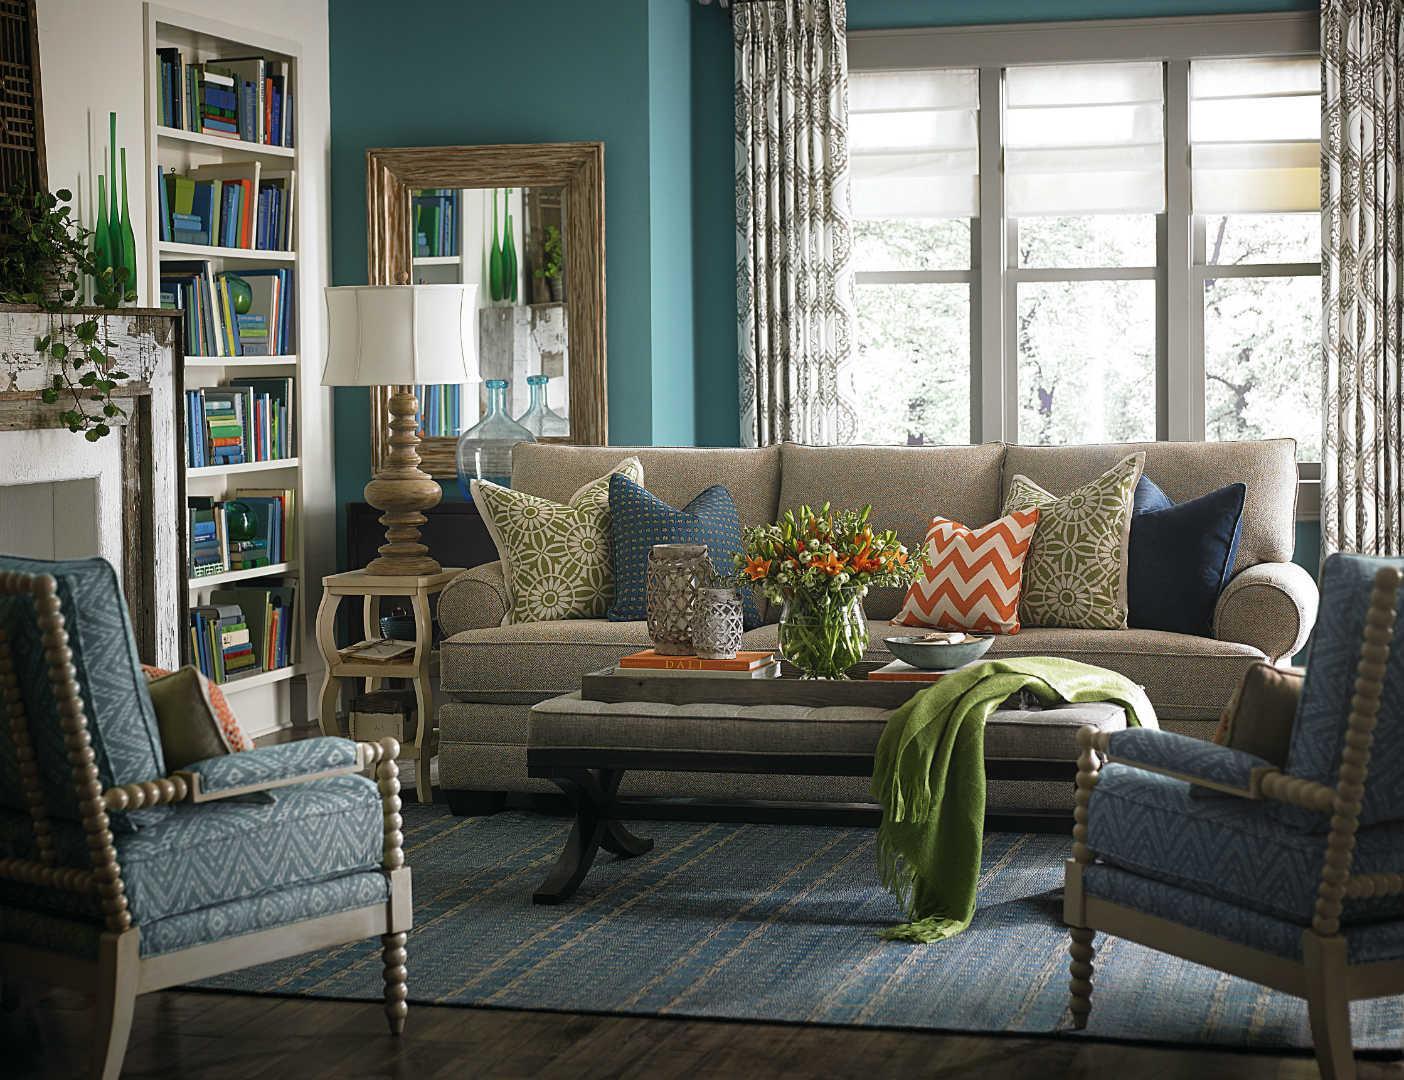 bassett hgtv home design studio 7000 customizable large sofa great american home store sofa. Black Bedroom Furniture Sets. Home Design Ideas